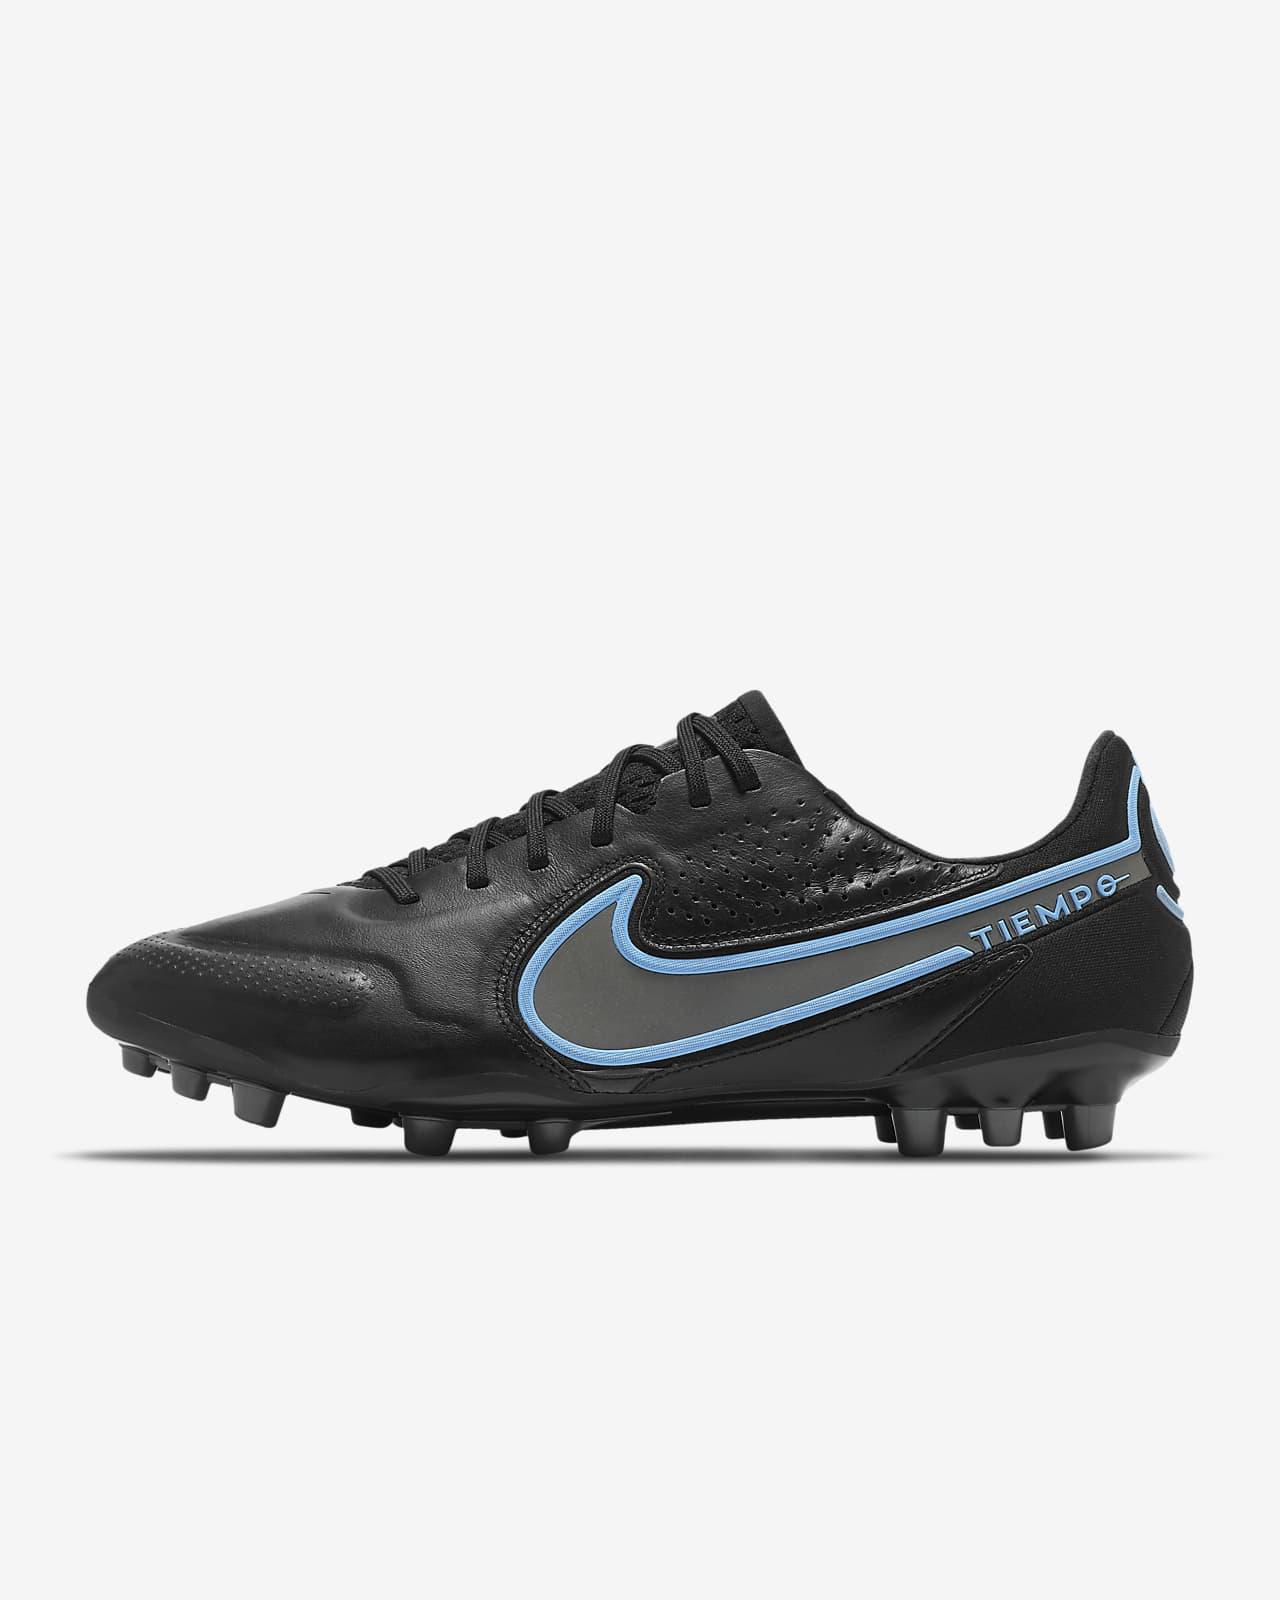 Nike Tiempo Legend 9 Elite AG-Pro Artificial-Grass Football Boot